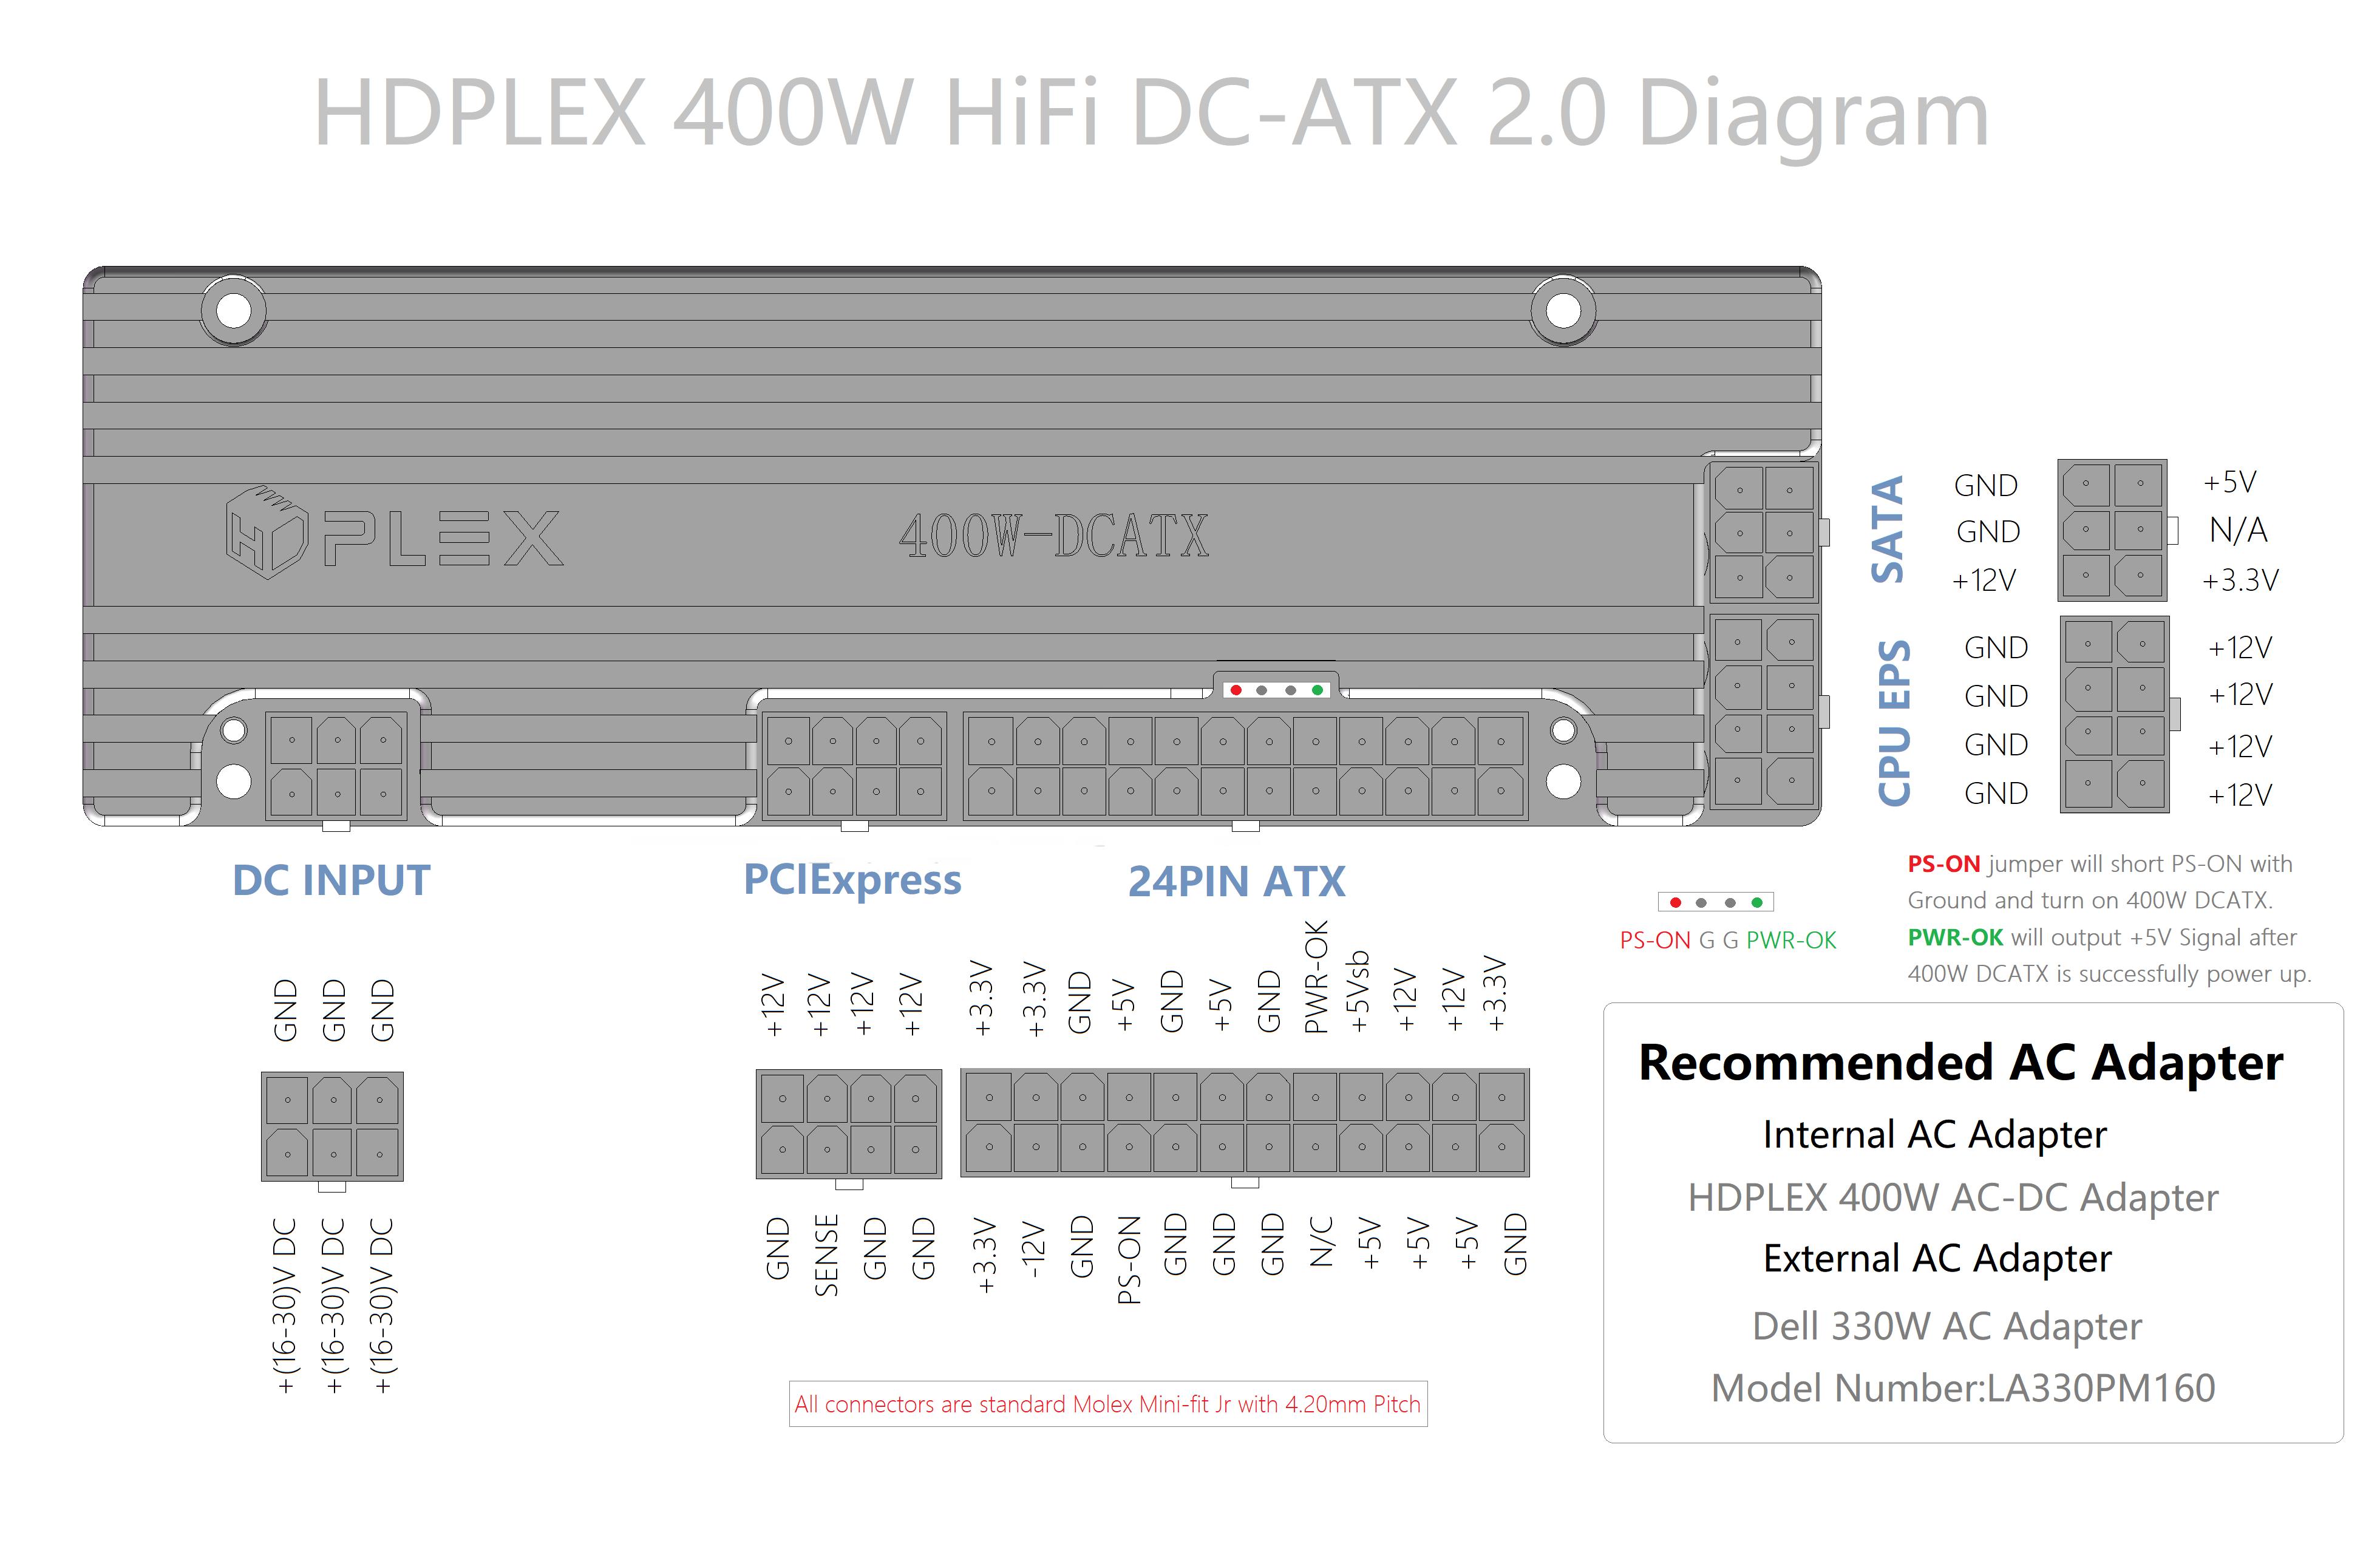 hdplex 400w hi-fi dc-atx converter i/o diagram